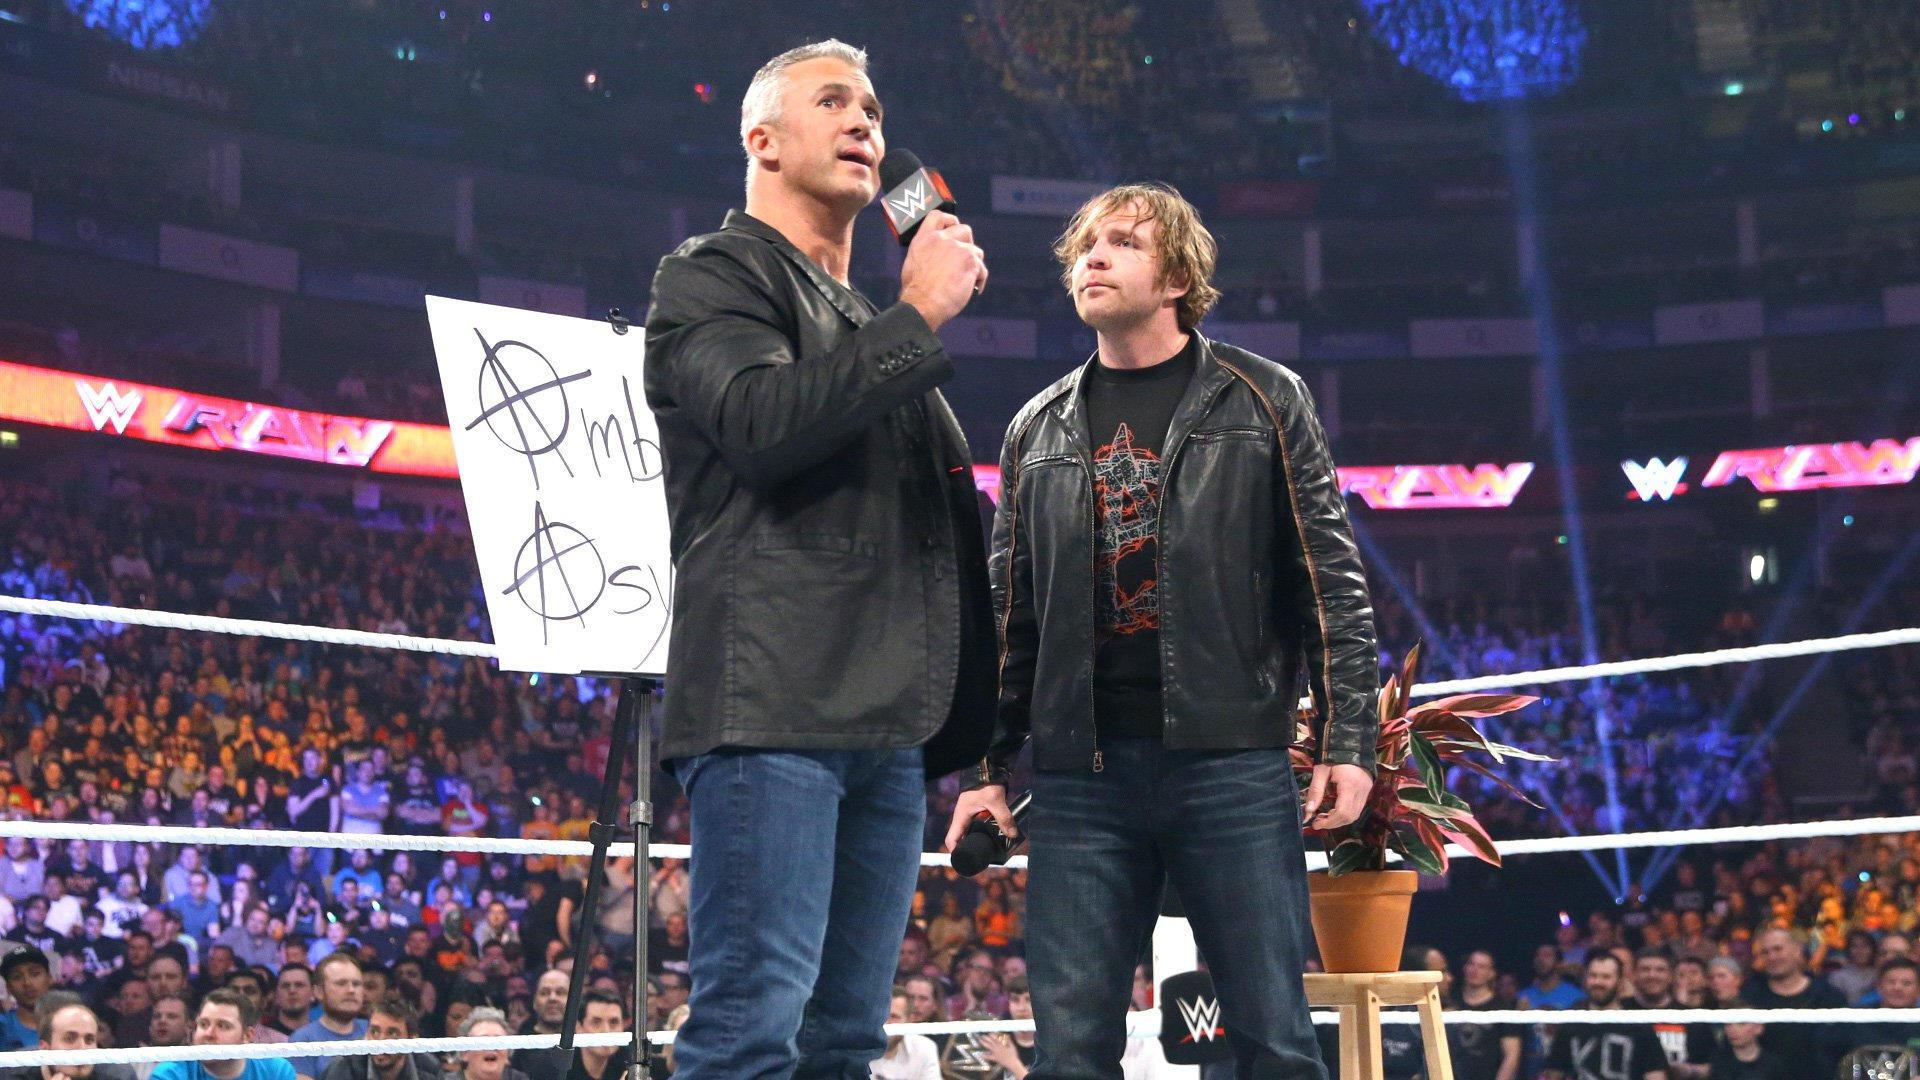 Resultats WWE RAW 18 avril